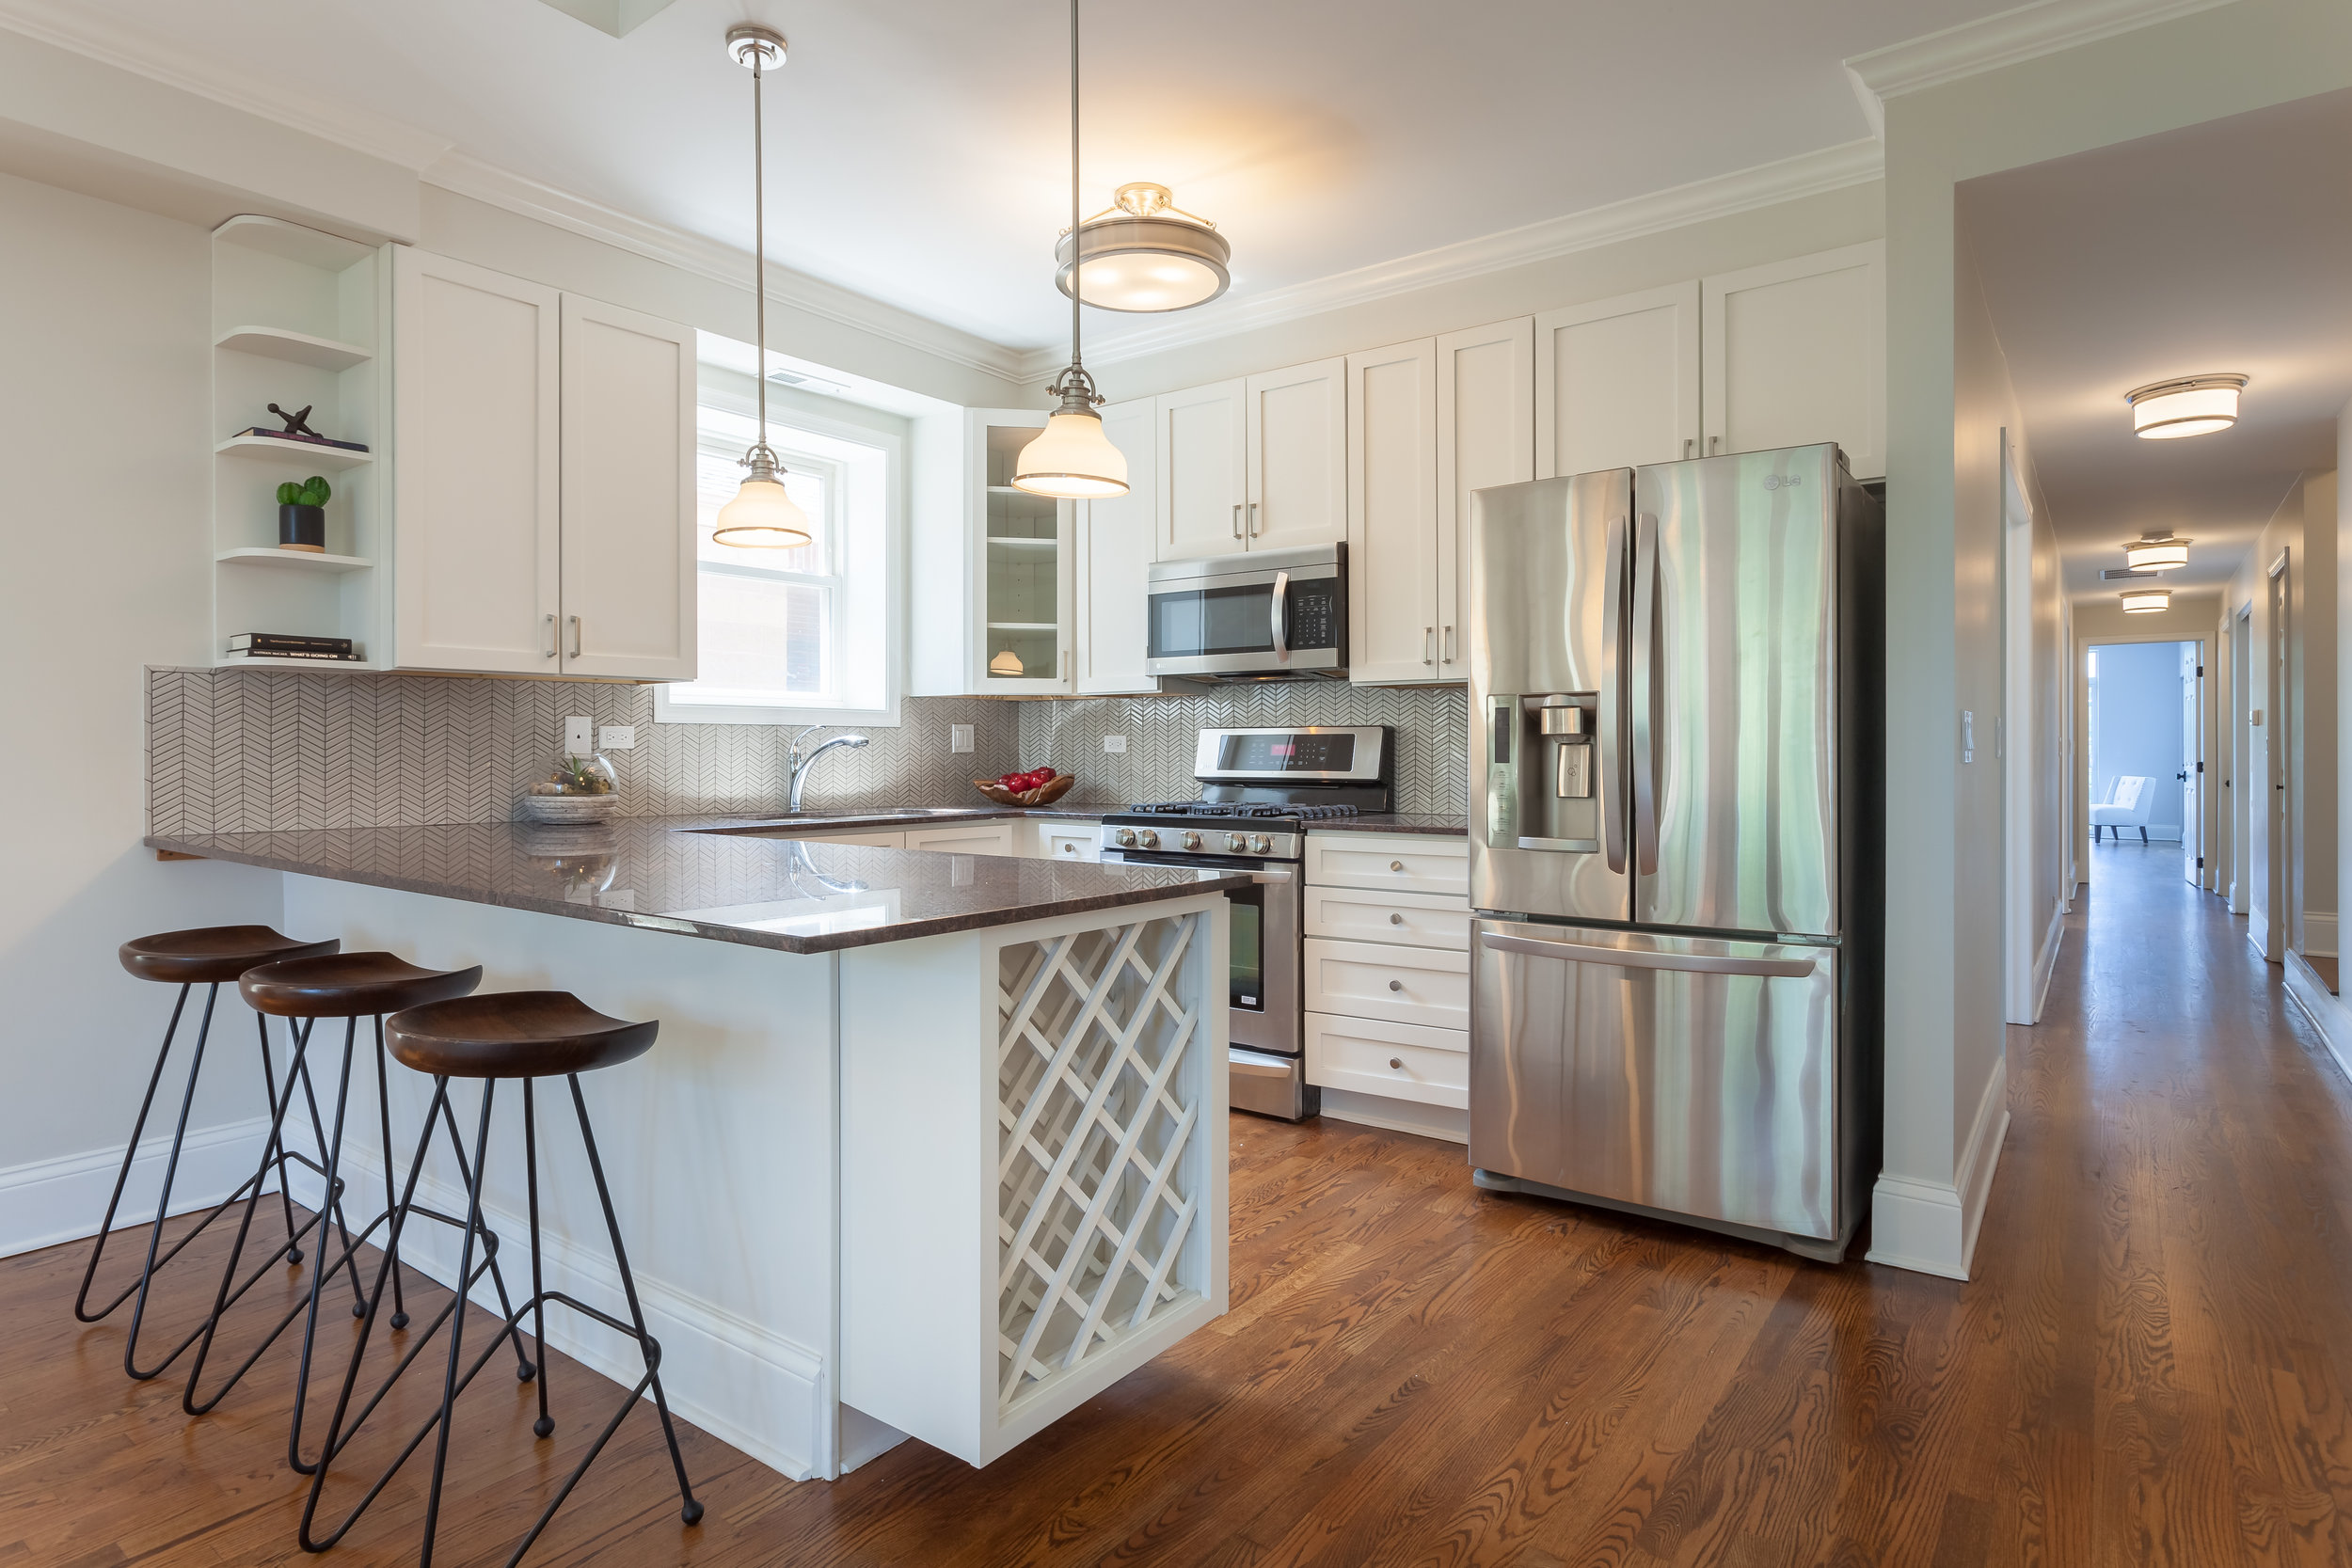 Northside Duplex - Construction Cost: $40,000Construction Time: 4 WeeksMarket Time: 1 DayList Price: $615,000Sale Price: $609,000